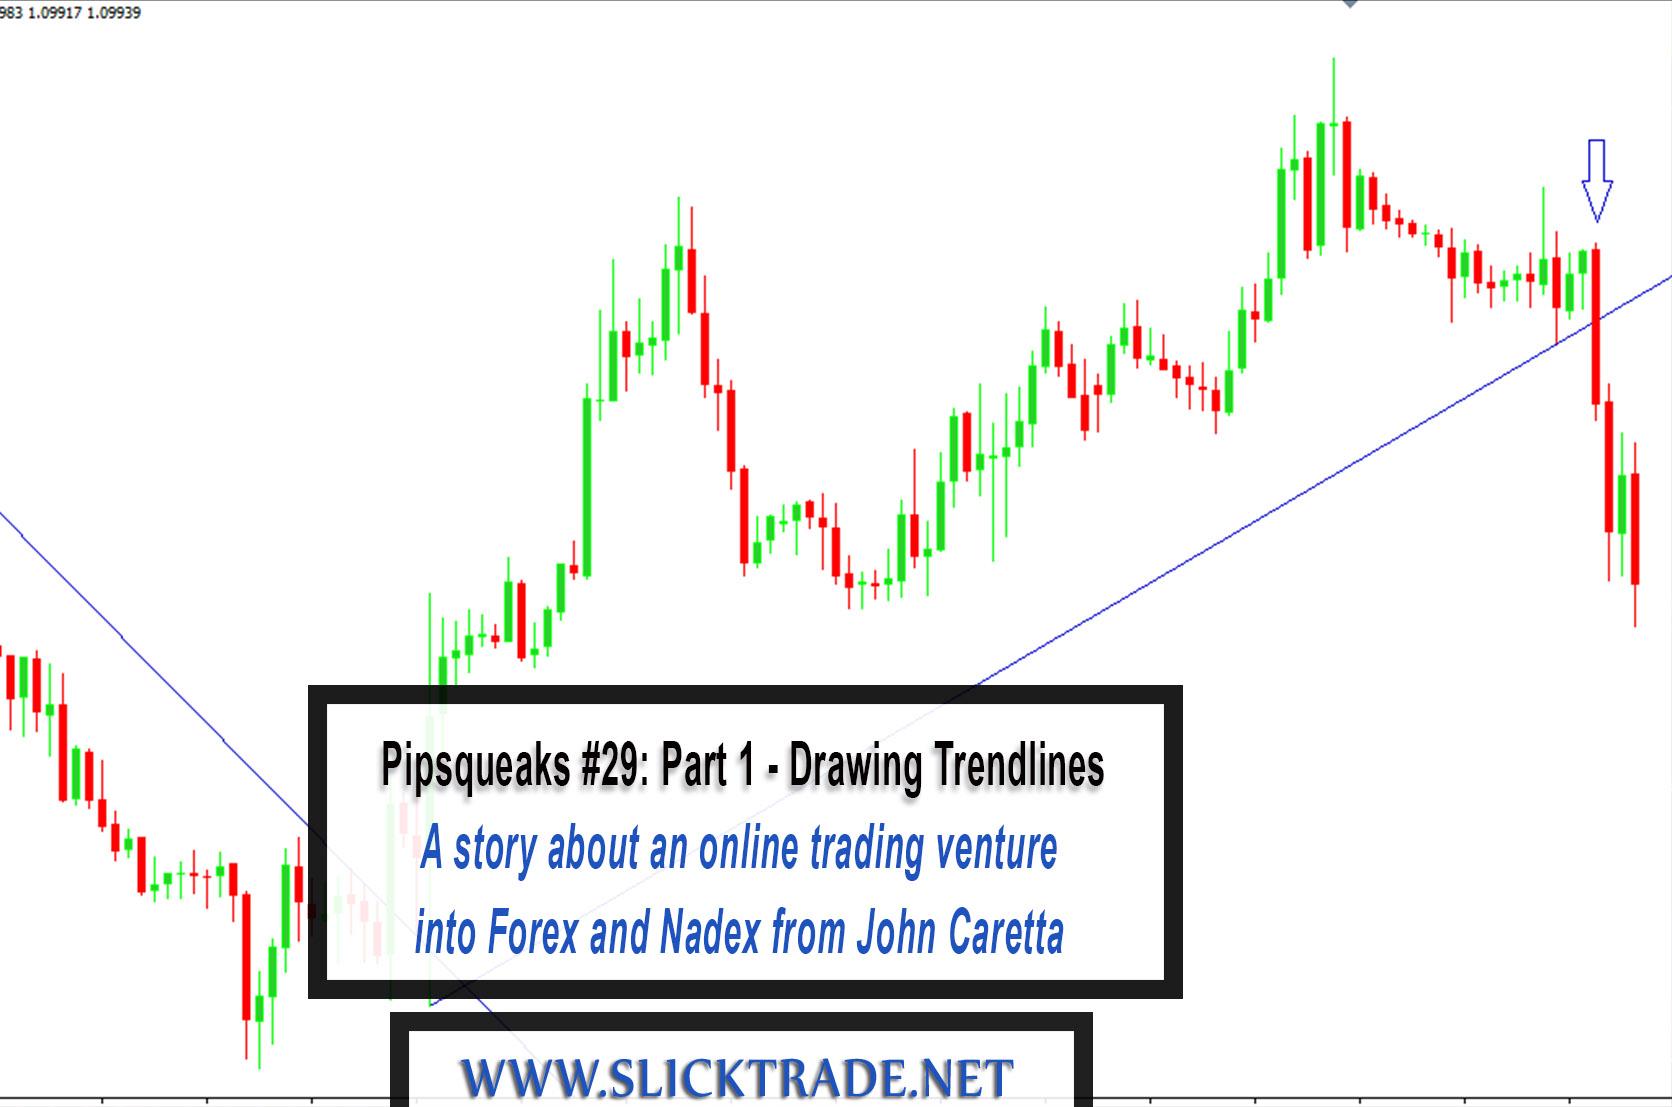 Pipsqueaks 29 Drawing Trendlines Forex 1